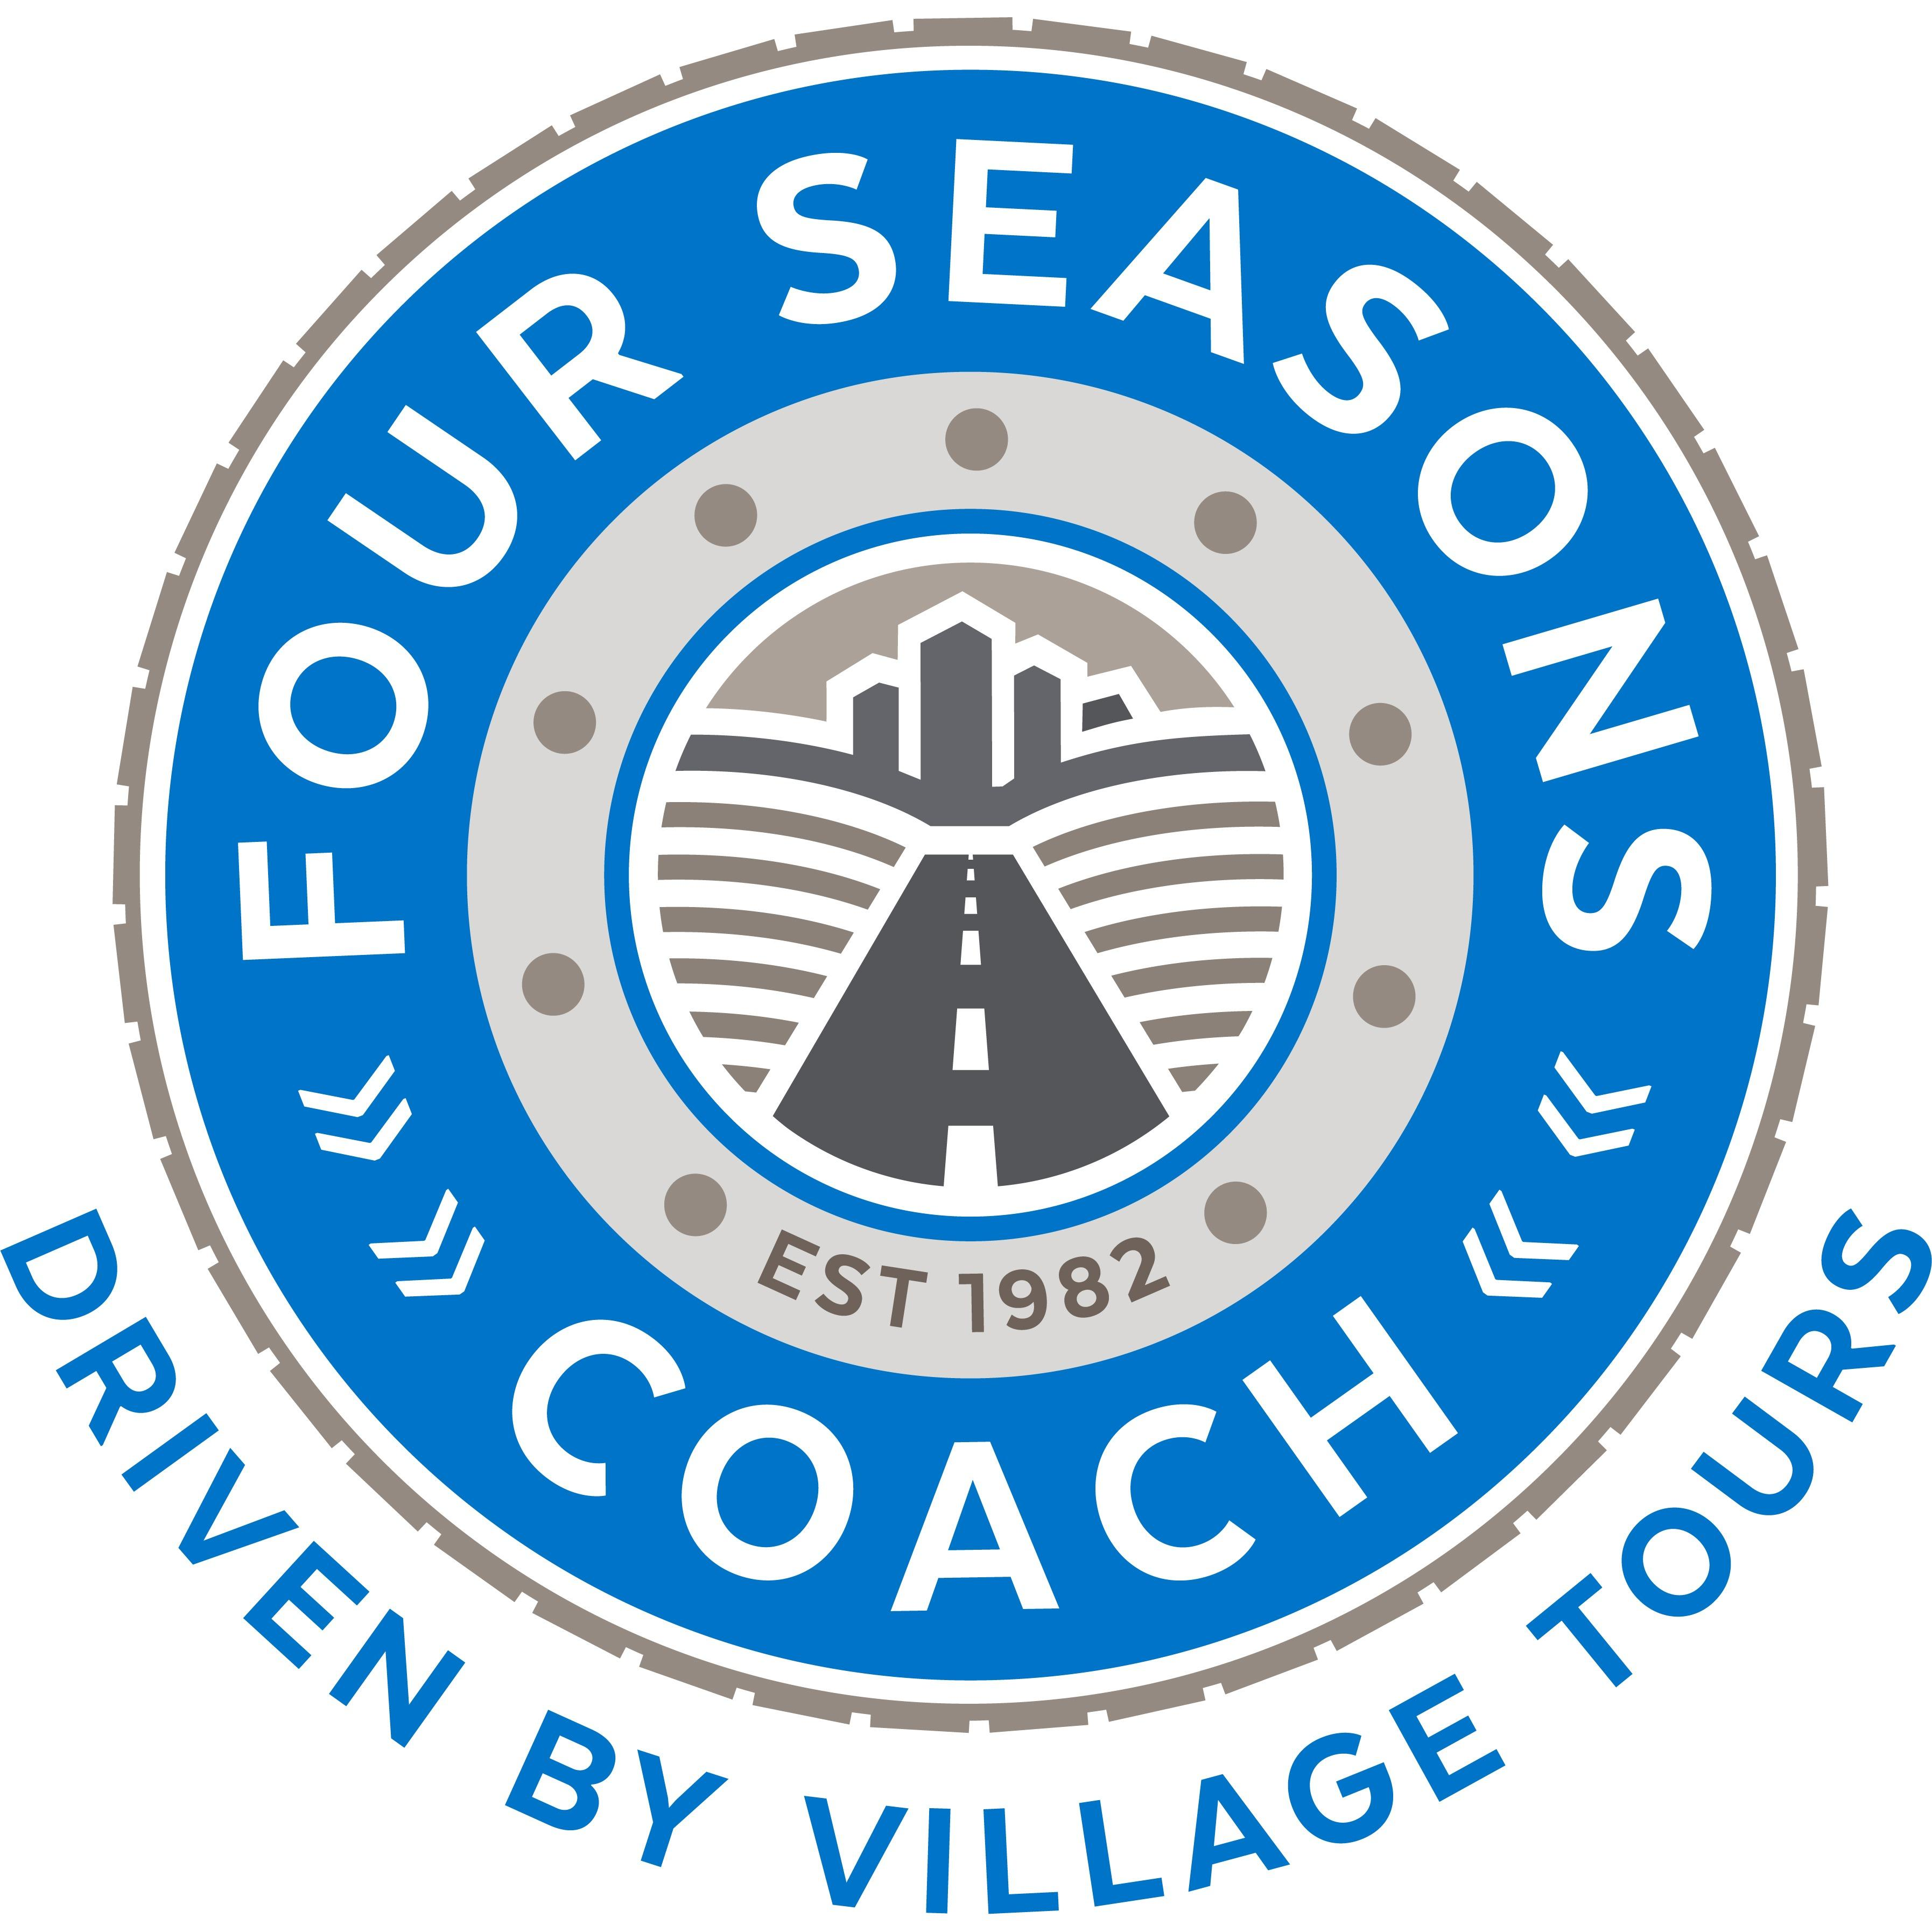 Four Seasons Coach